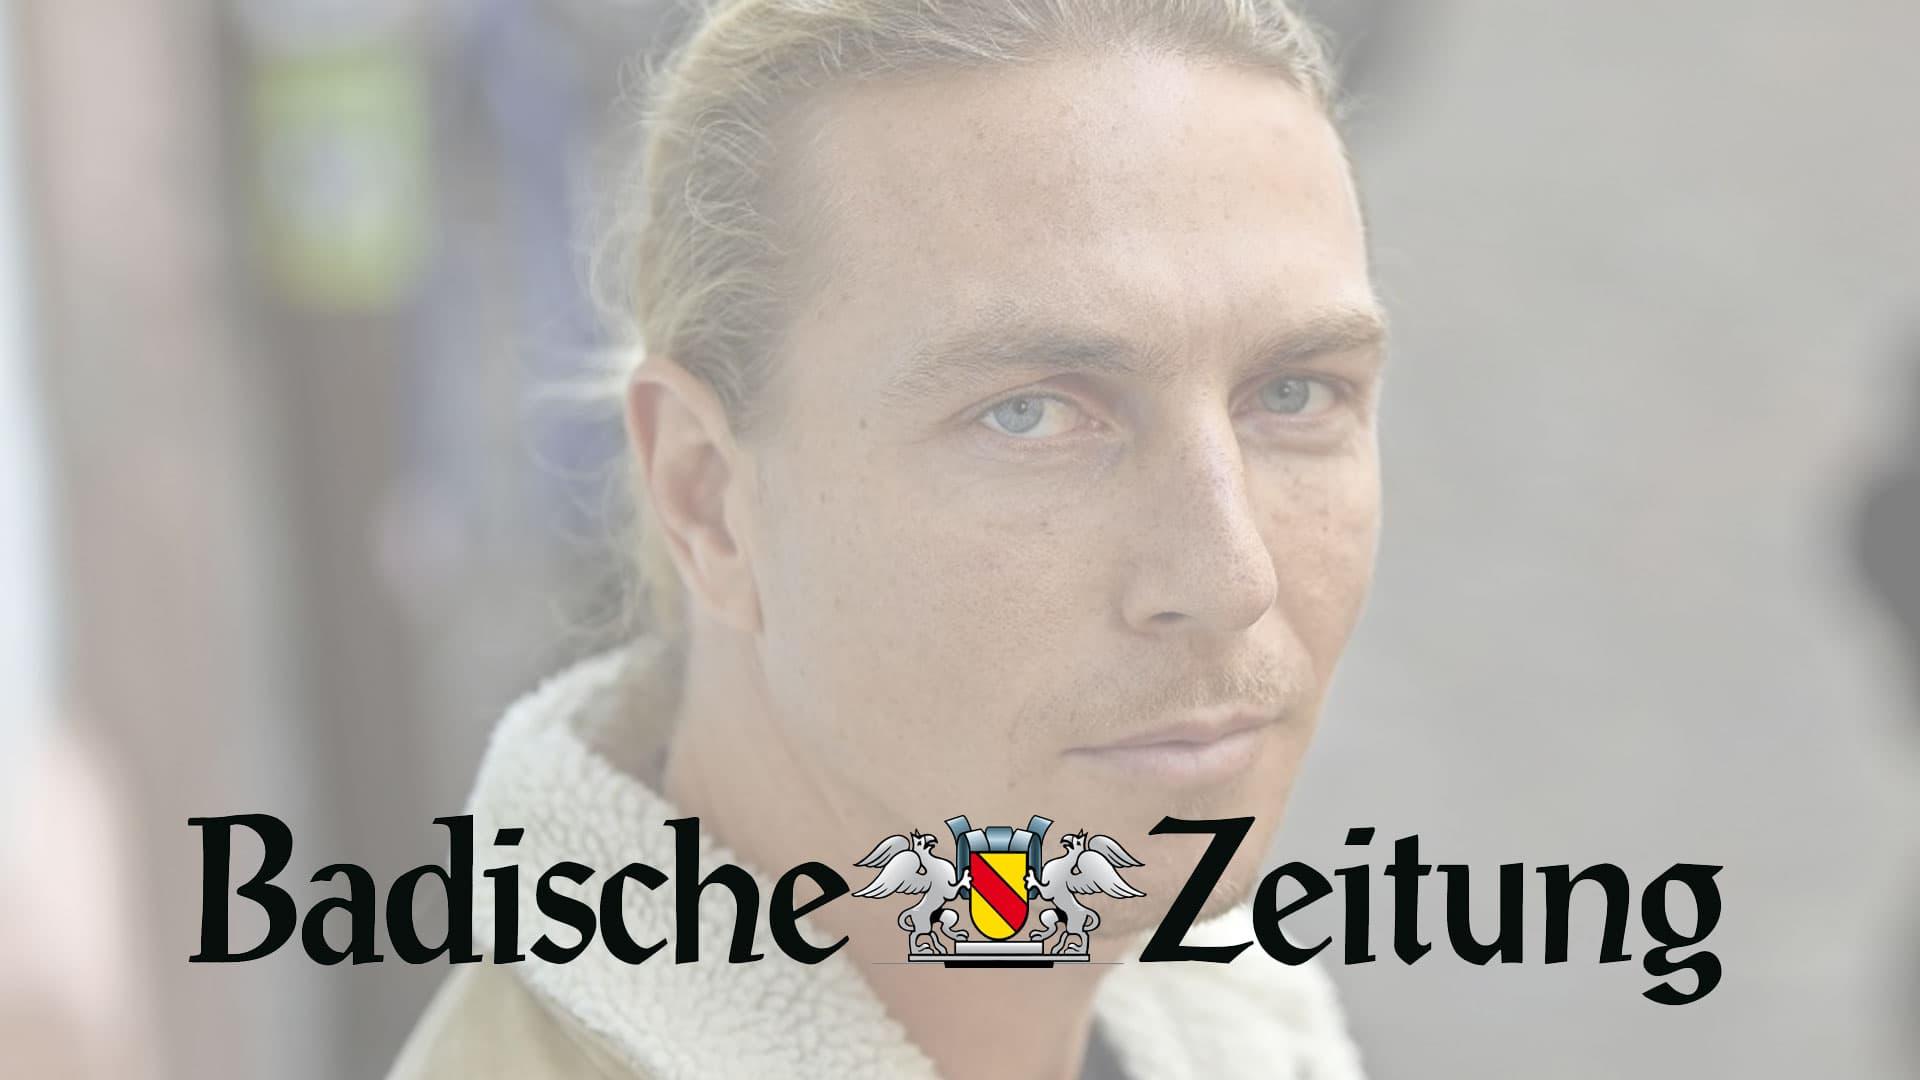 QULT Badische Zeitung Engagiert Freiburg Jens Gläsker